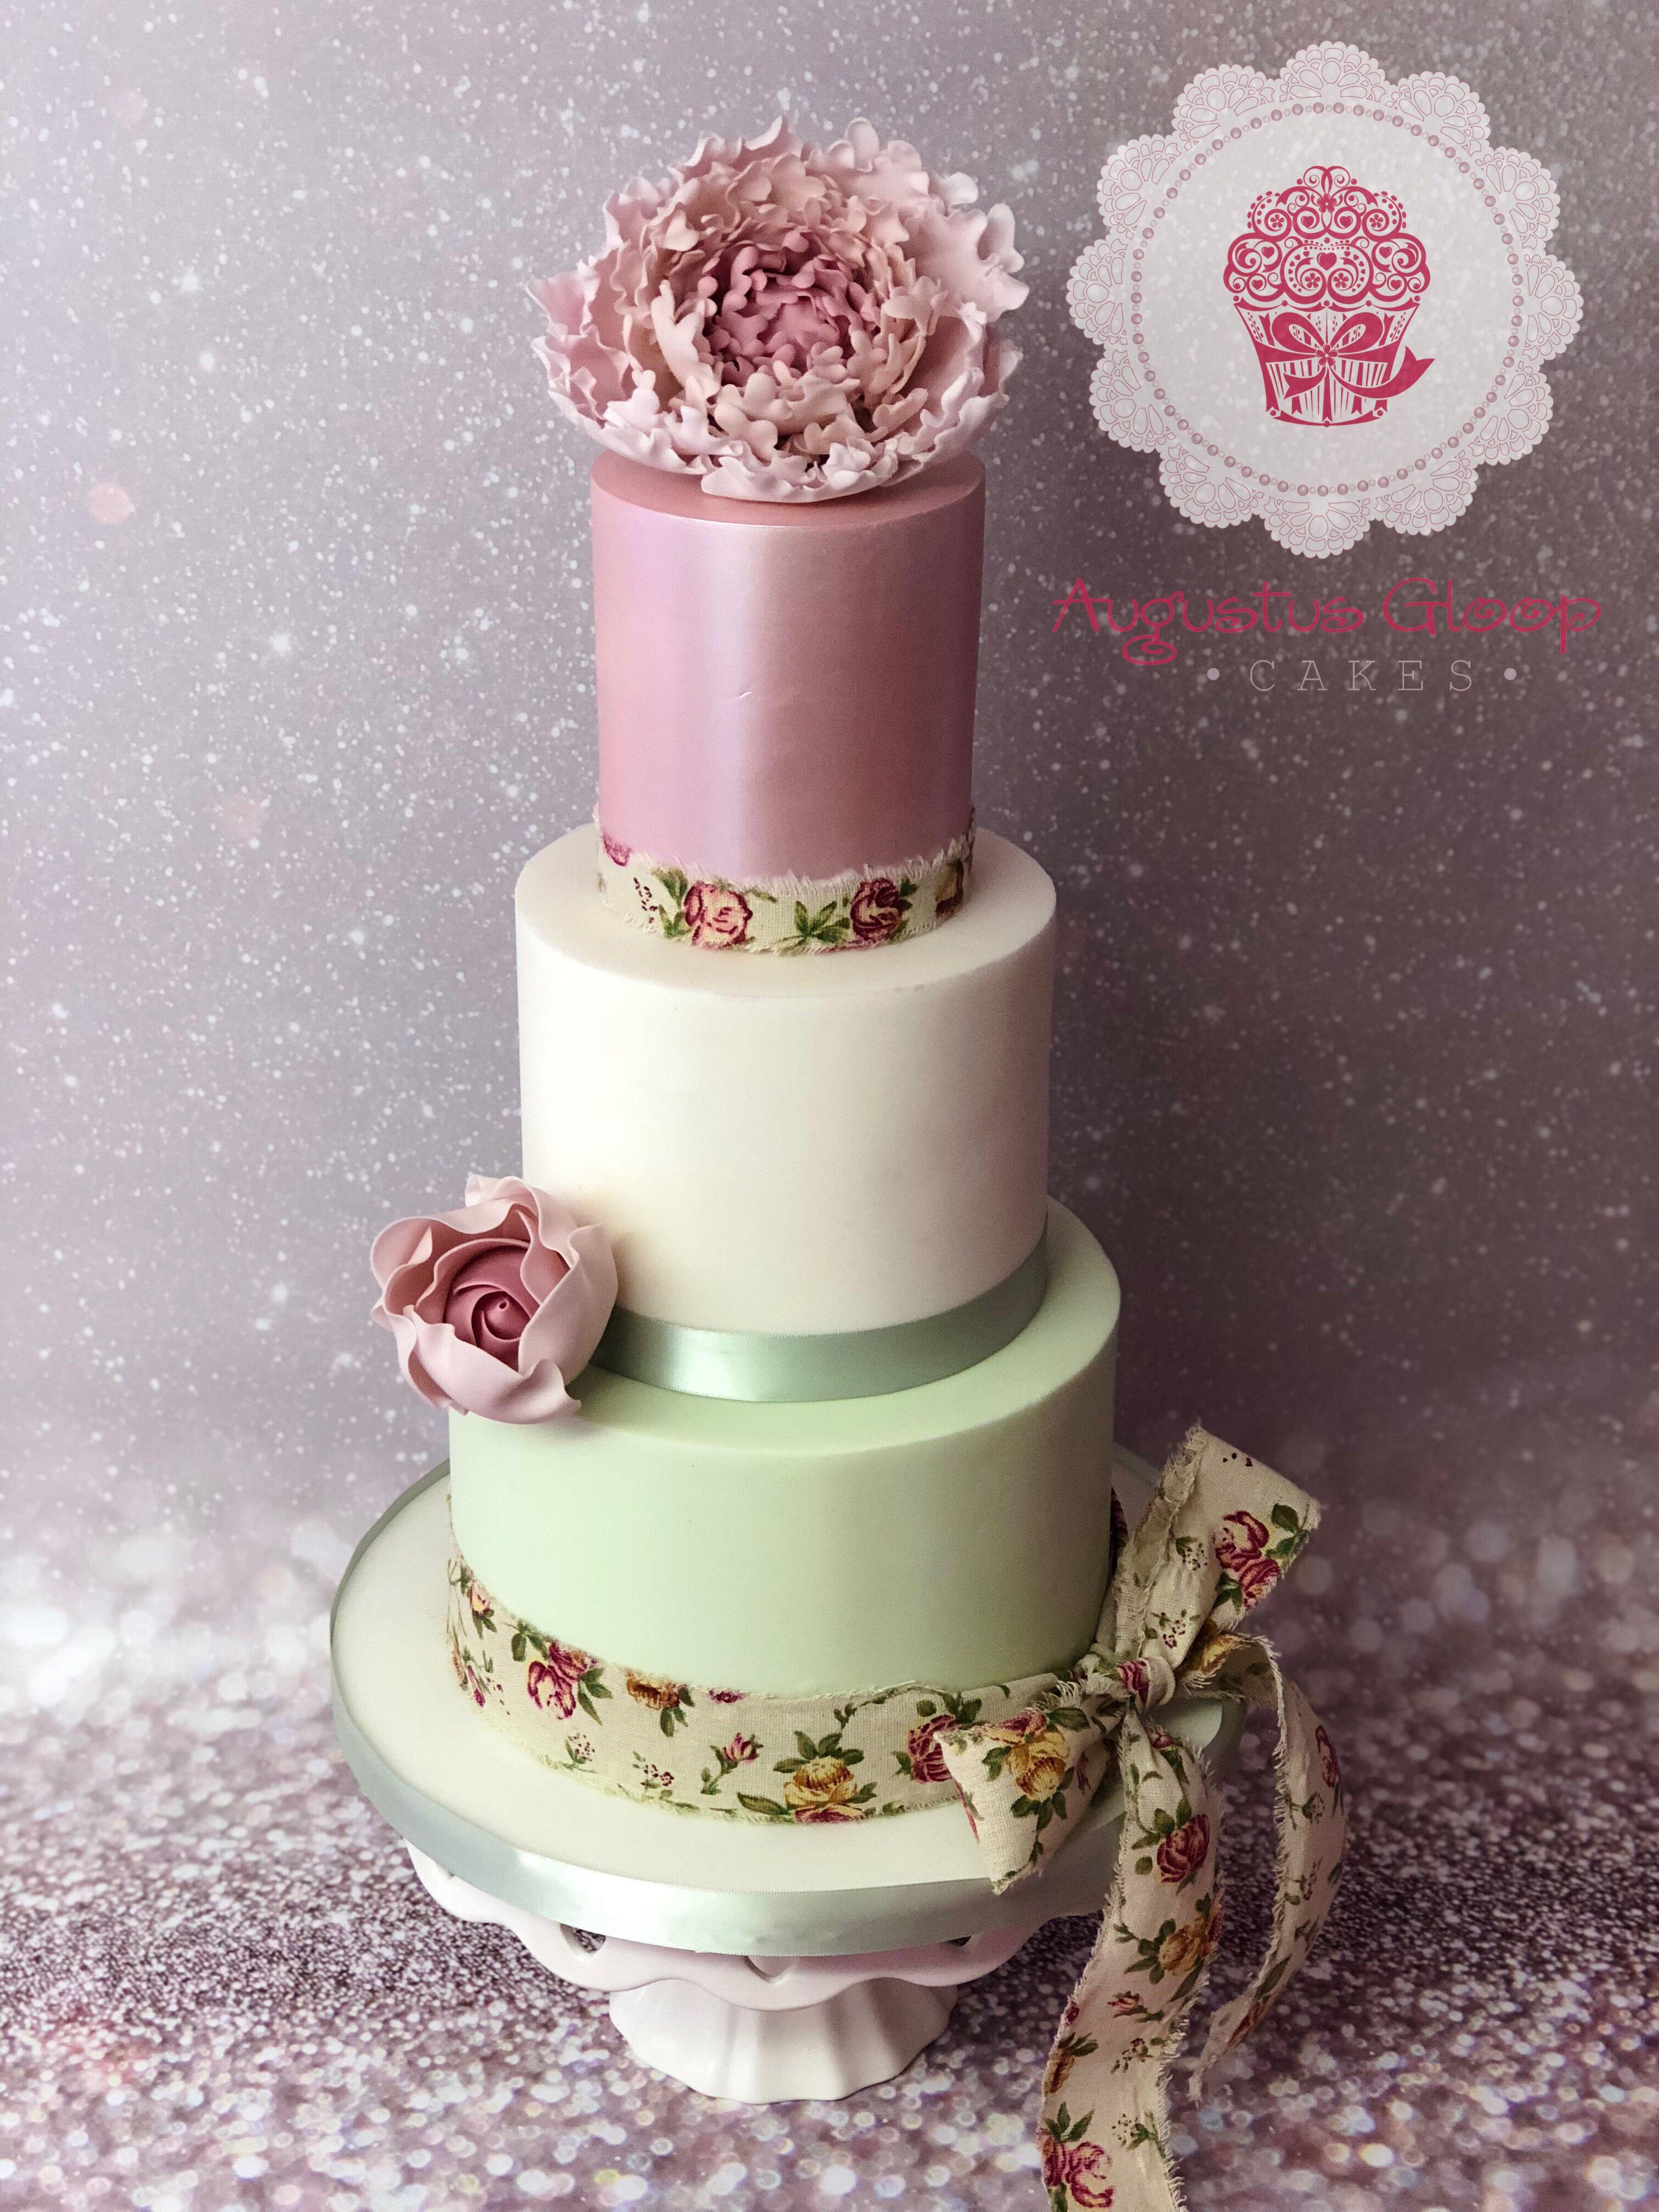 Augustus gloop wedding cakes cake my dream cake gluten